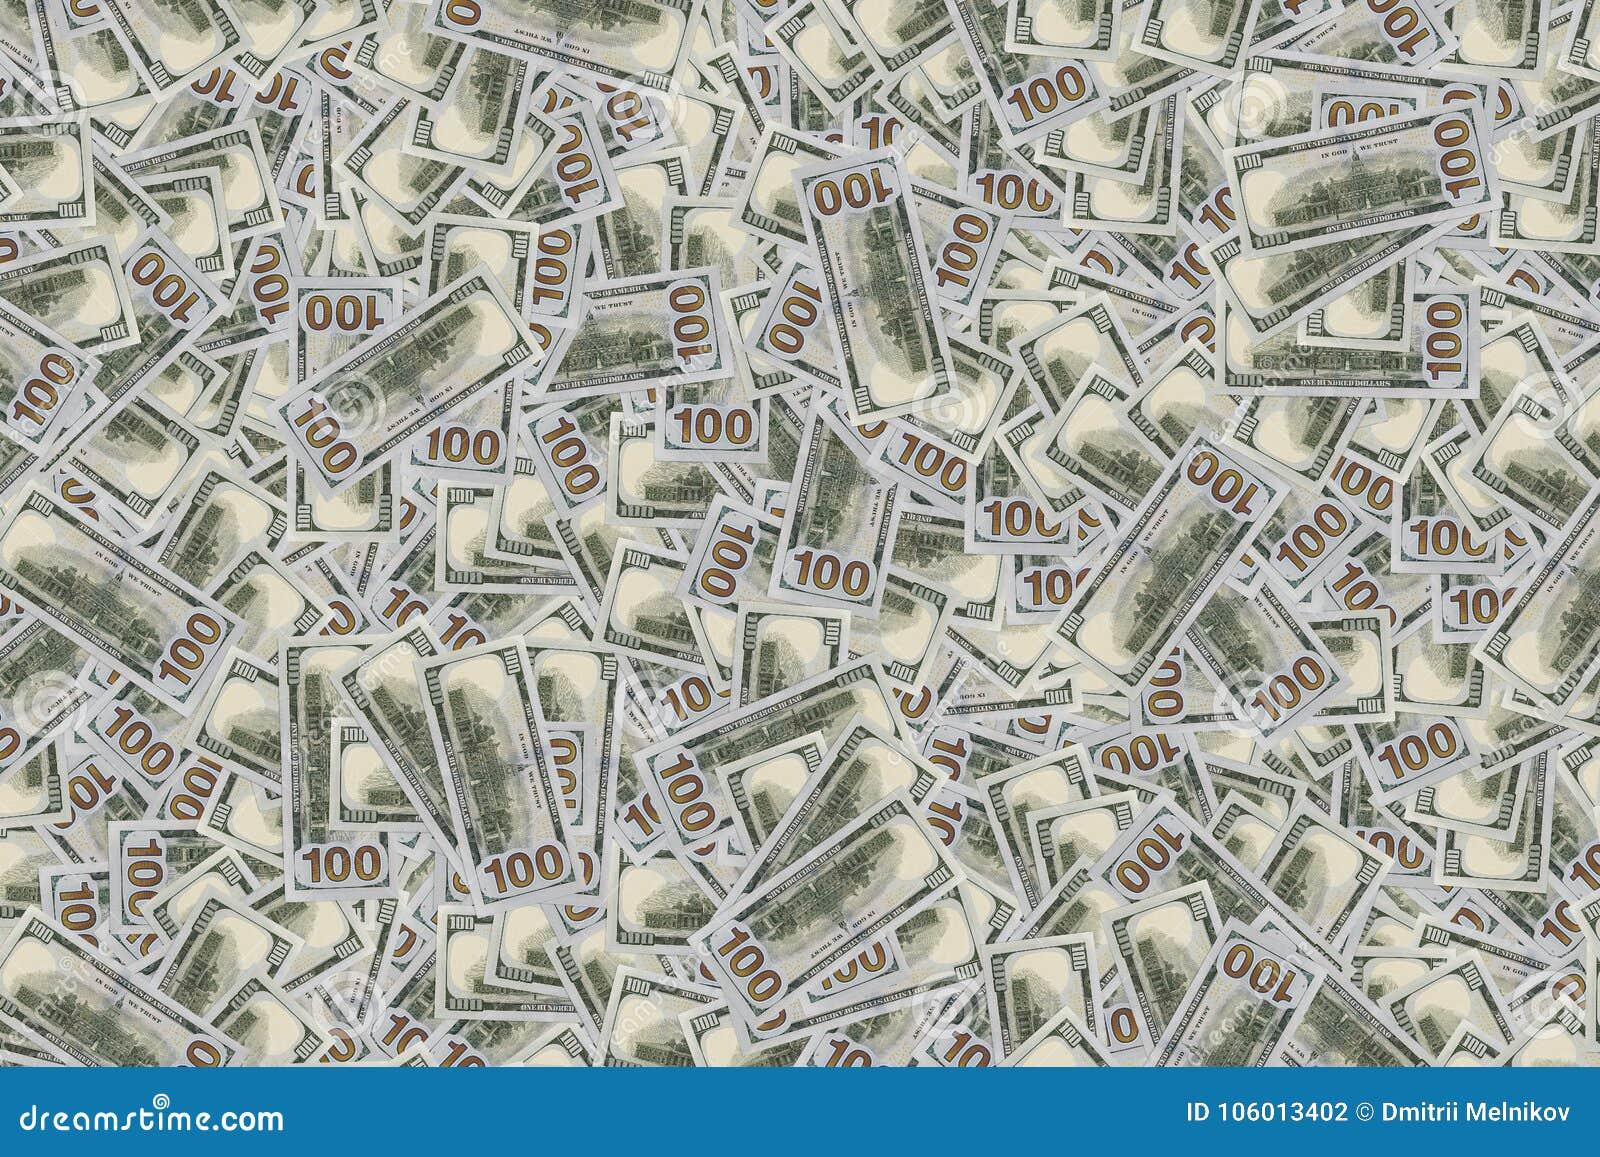 money pile 100 dollar bills stock photo image of finance green